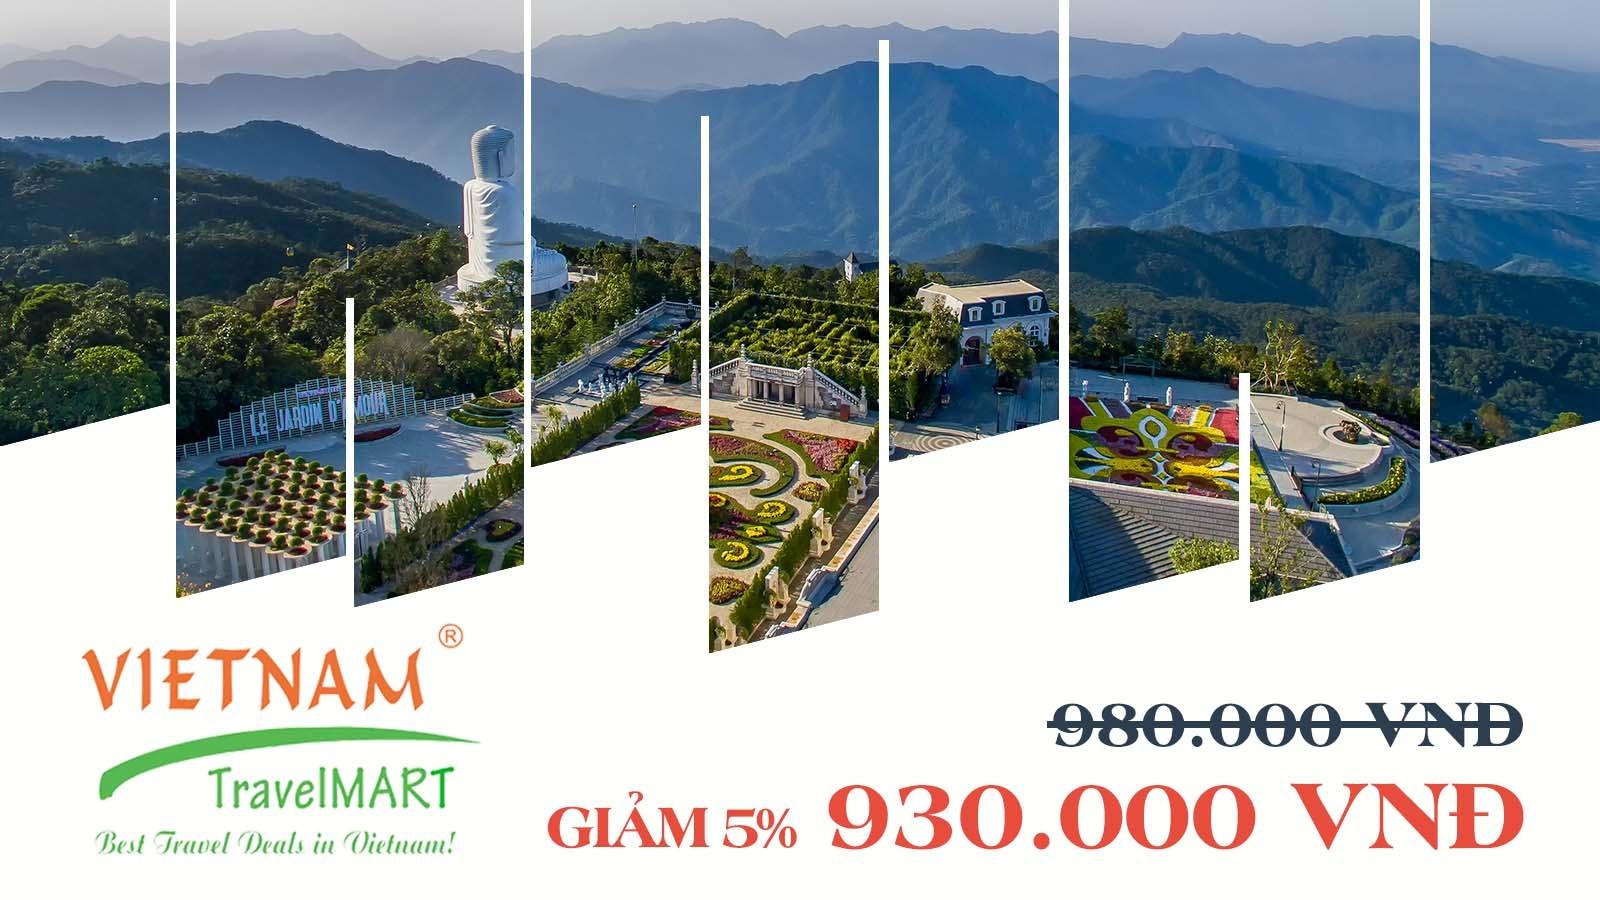 Vietnam TravelMART JSC | Giảm 5% Tour Bà Nà 2